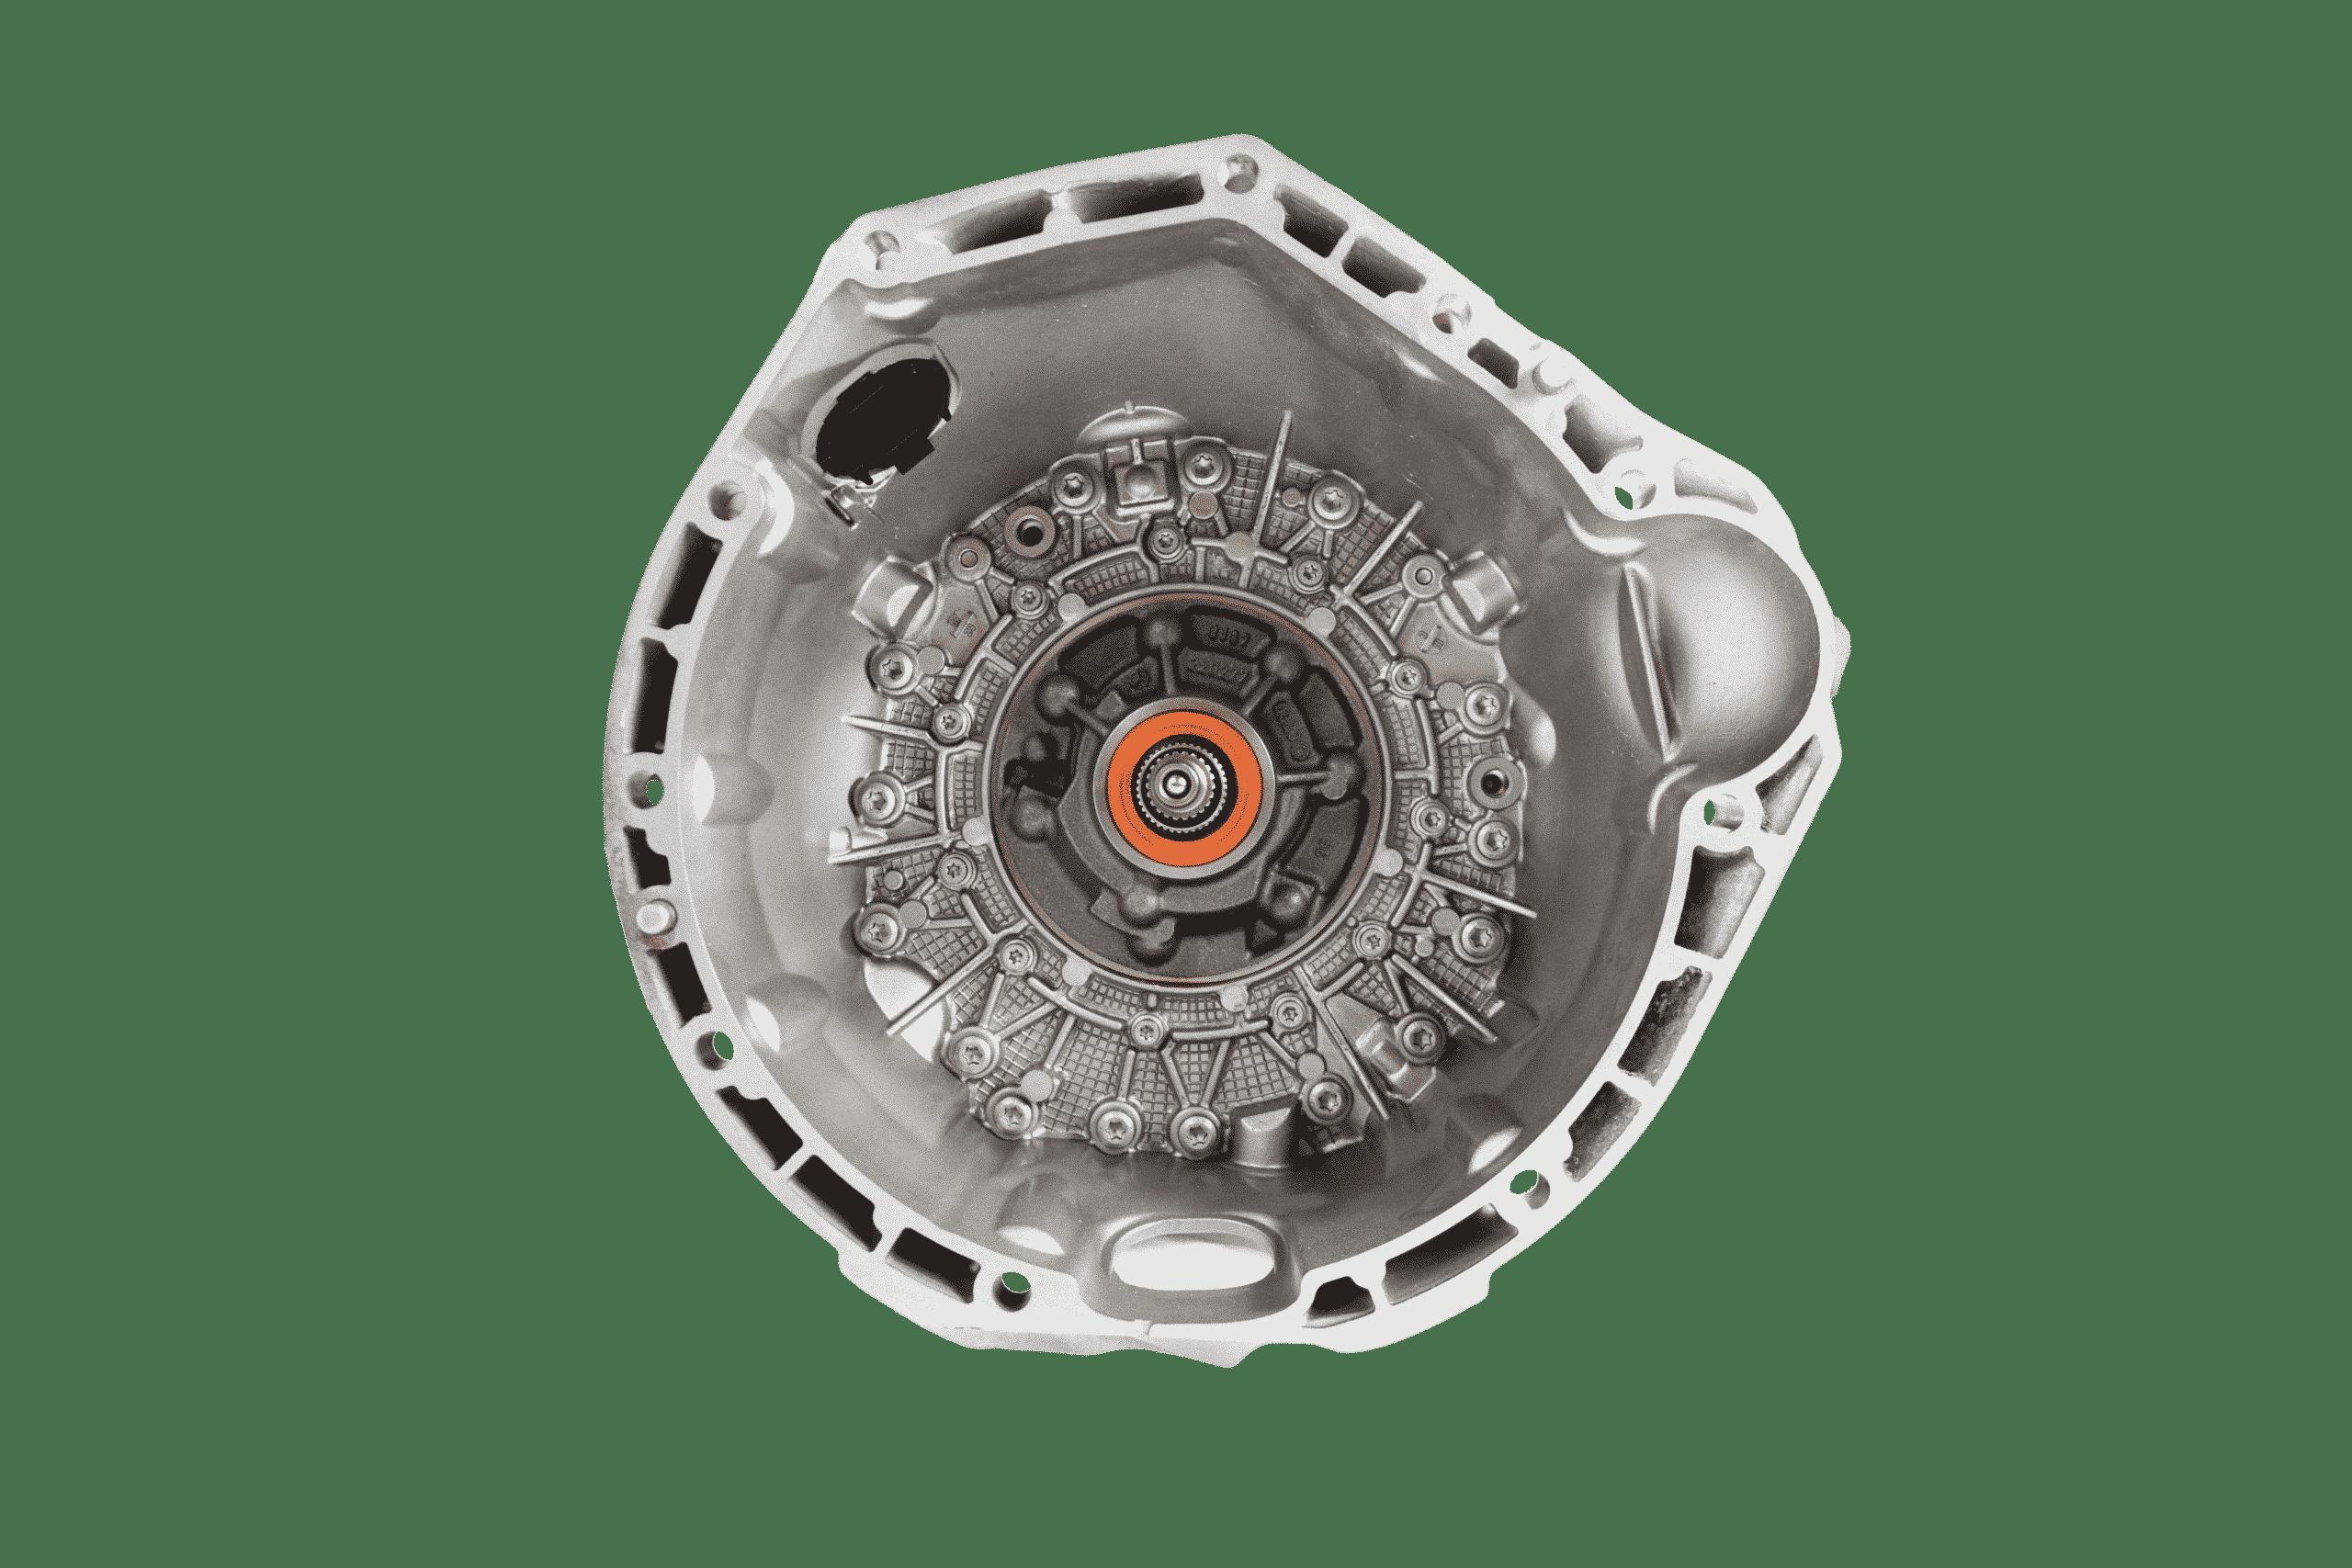 Einblick ins Mercedes 5 Gang Automatikgetriebe | ATT24